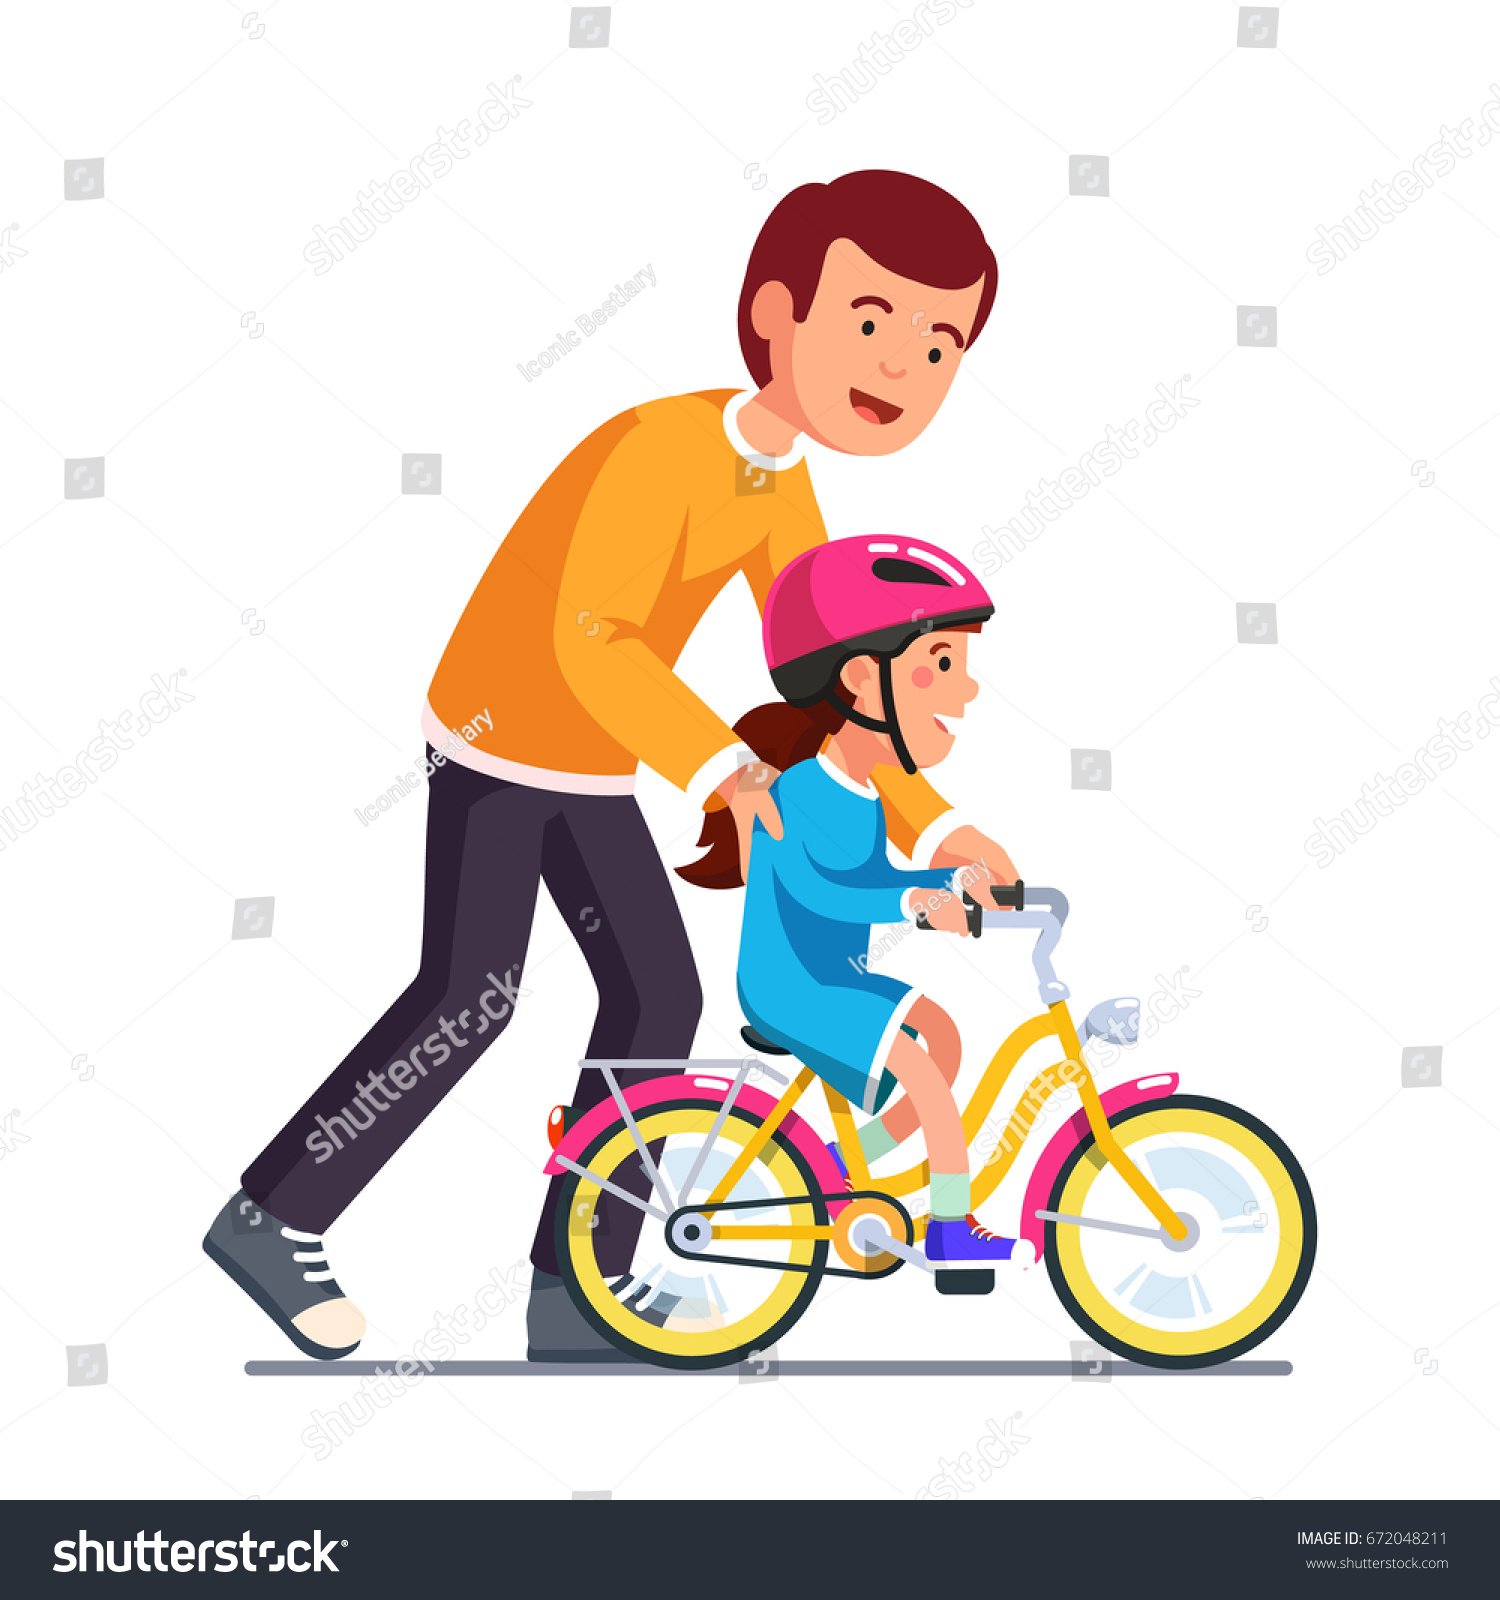 caring dad teaching daughter ride bike stock vector royalty free